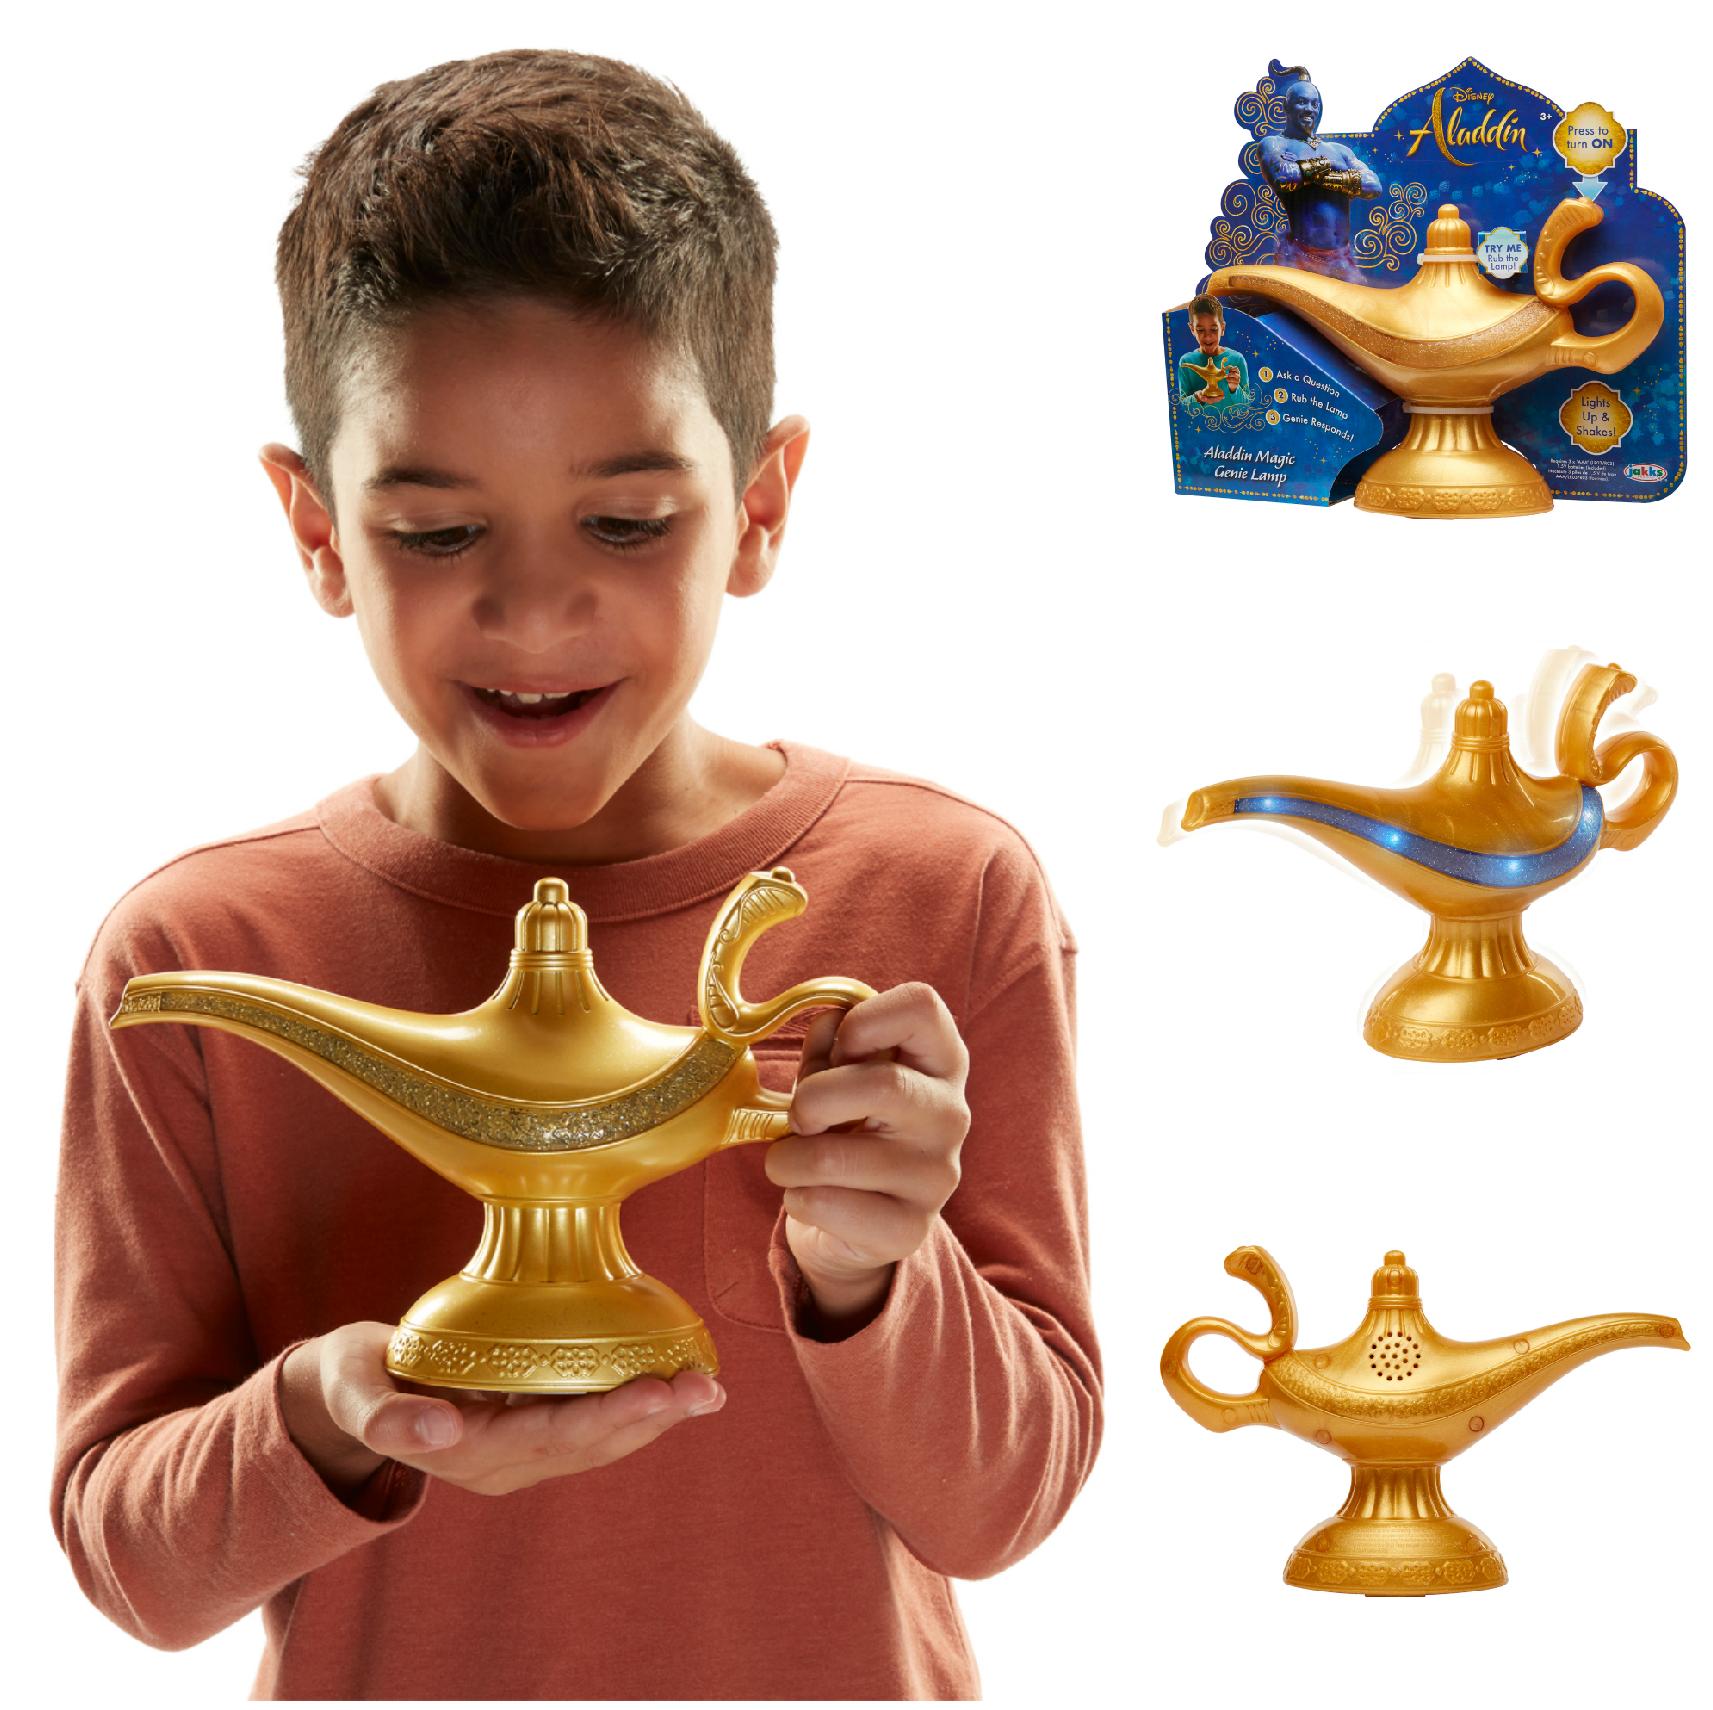 Aladdin Exclusive First Look At Products From Jakks Jakkstoys